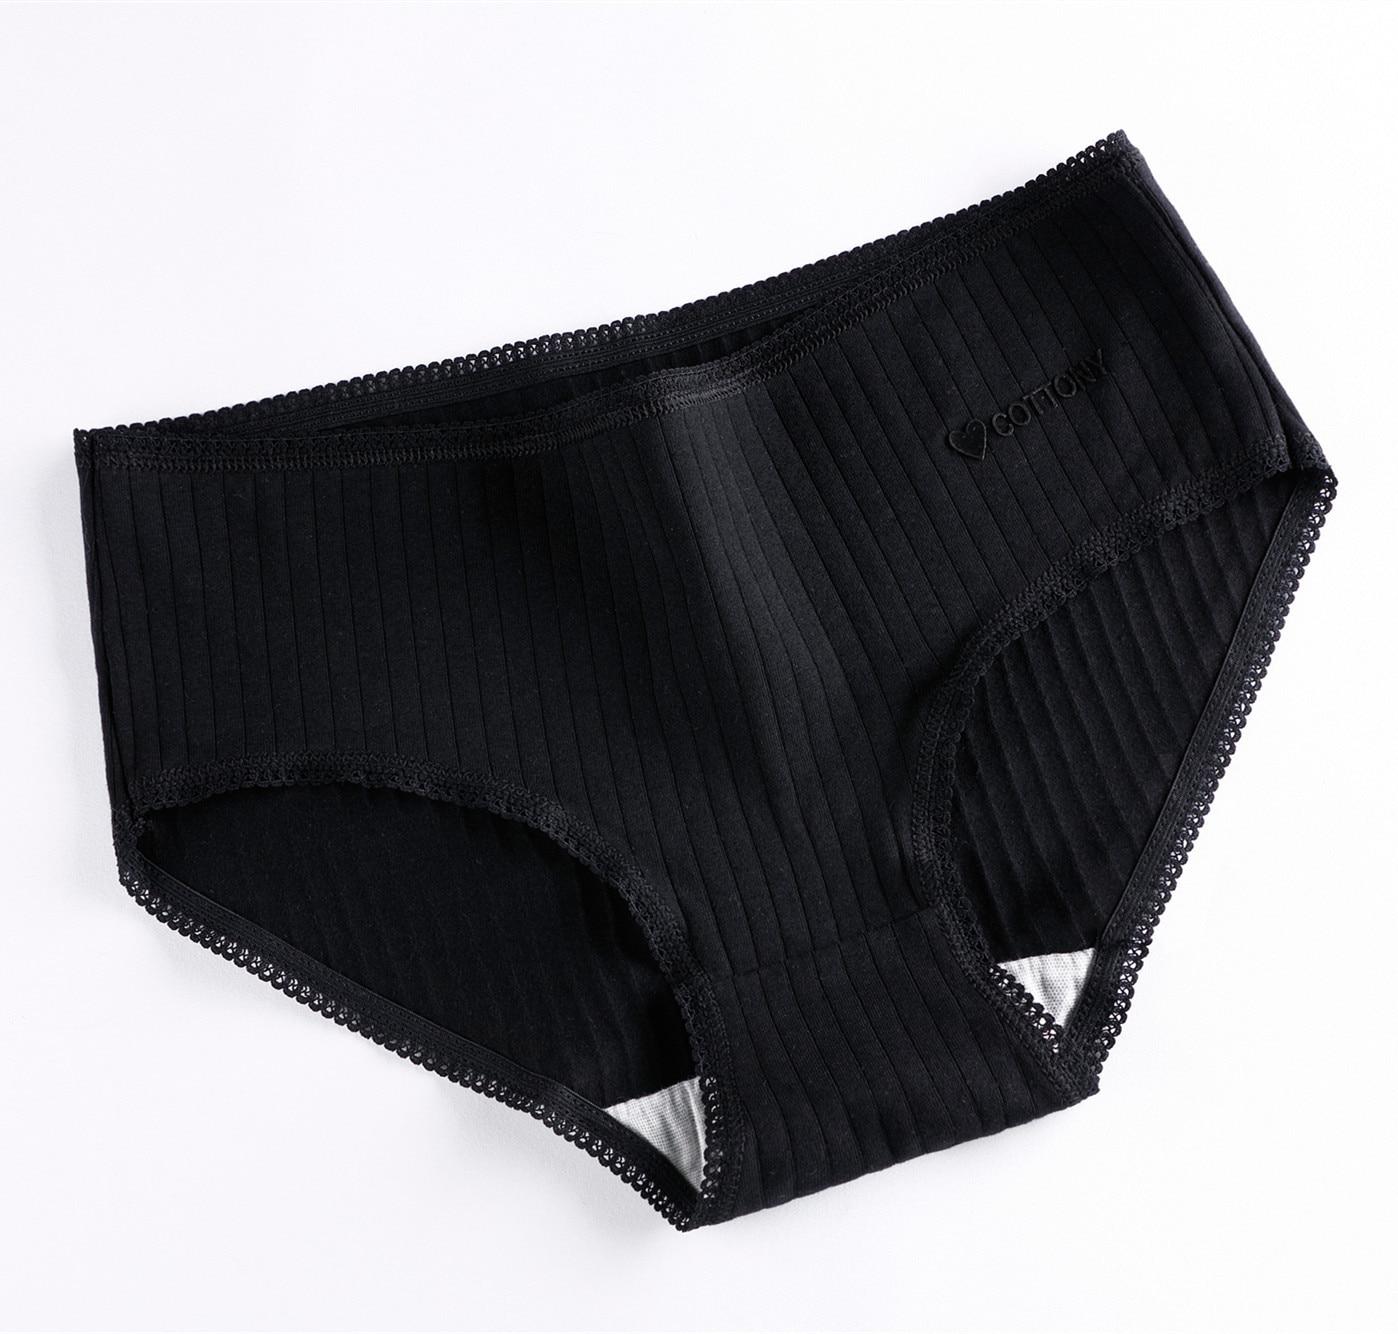 M-XL Women's Panties 3Pcs Cotton Solid Color Girl Briefs Sexy Lingerie Female Underwear Ladies Underpants Women Intimate New